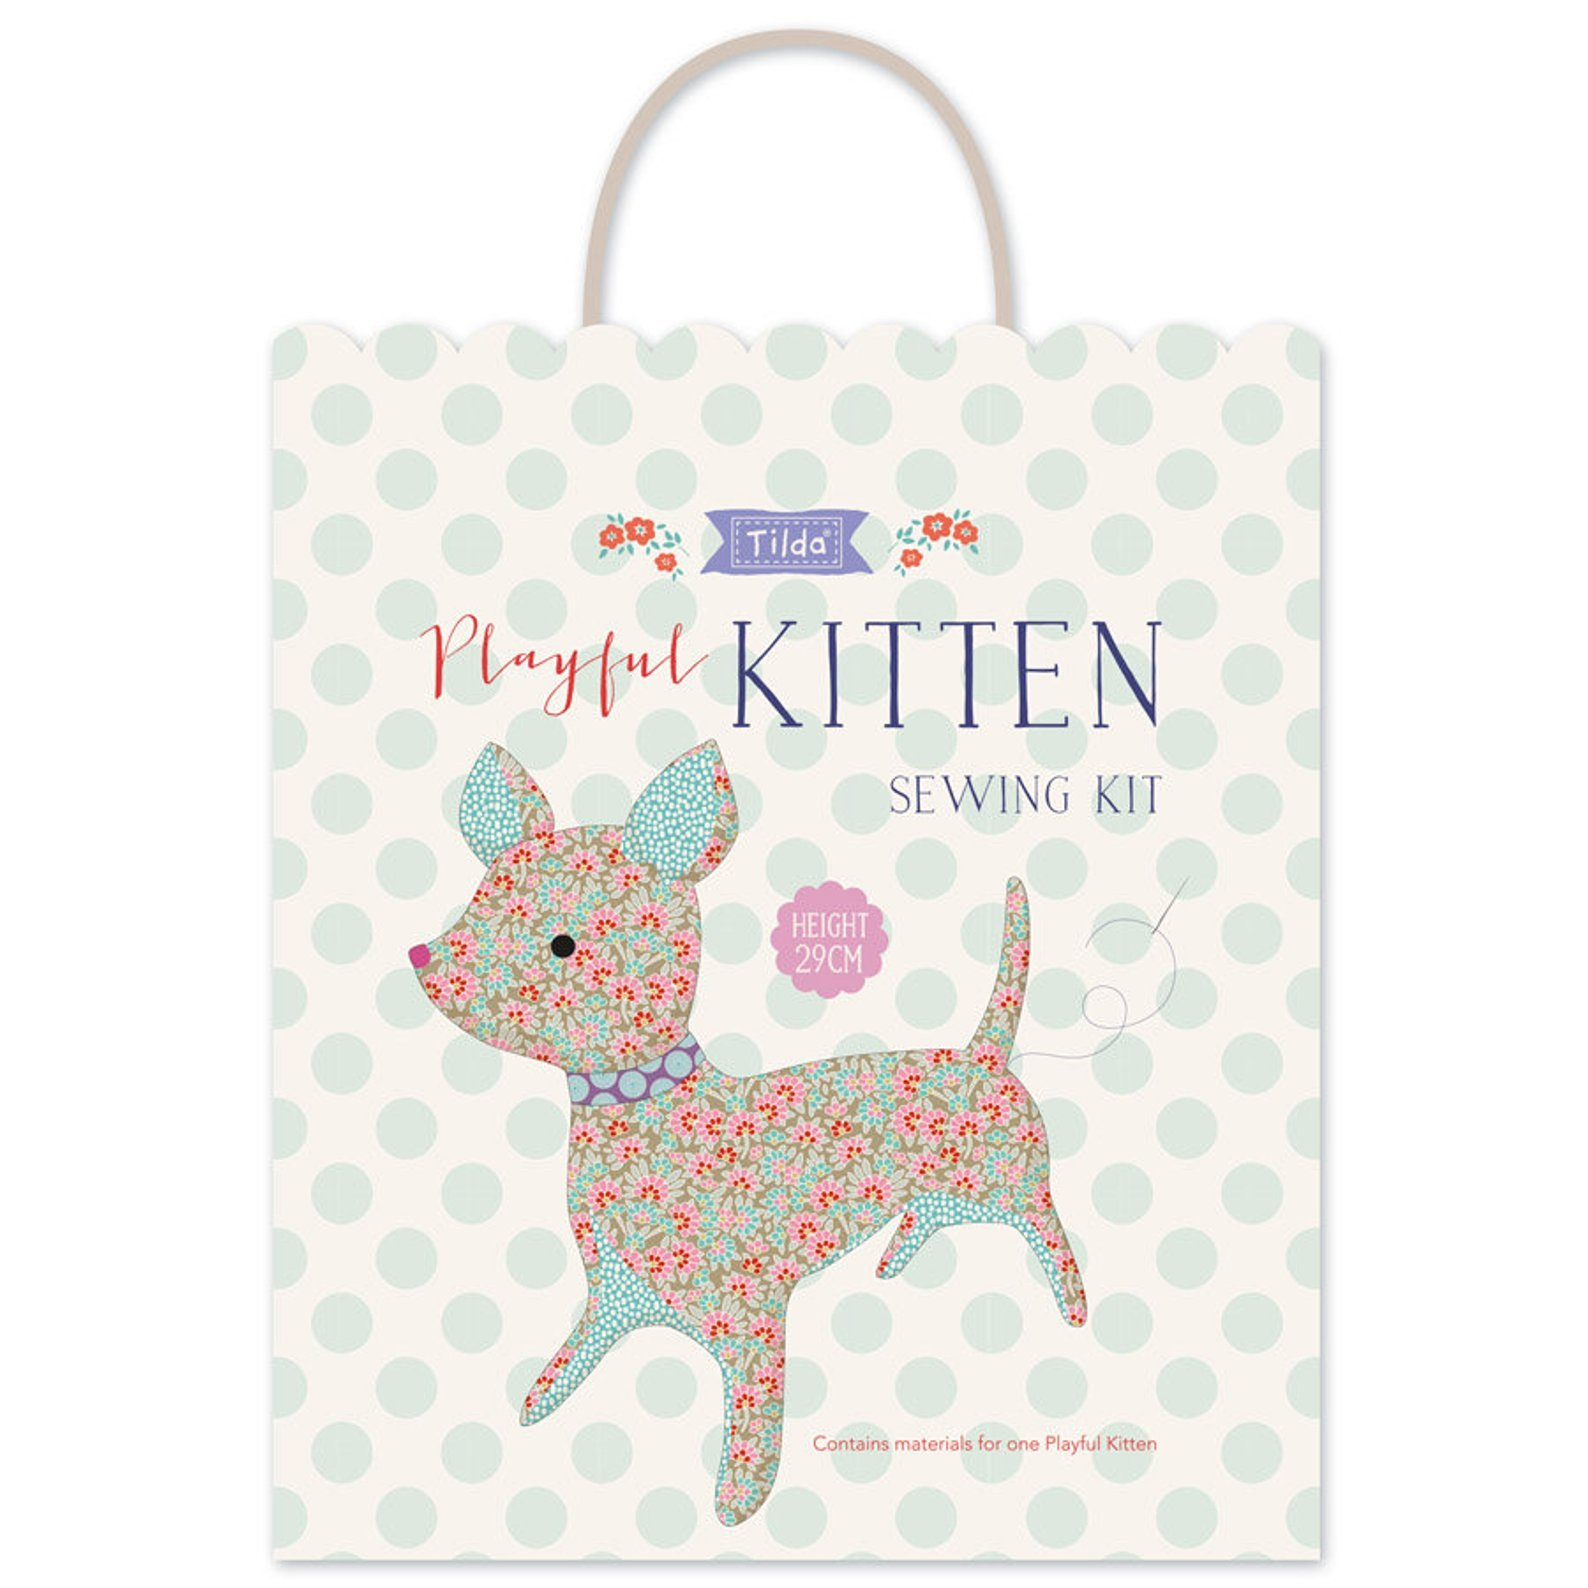 Tilda - Kit Lazy Days Playful Kitten Sewing Kit